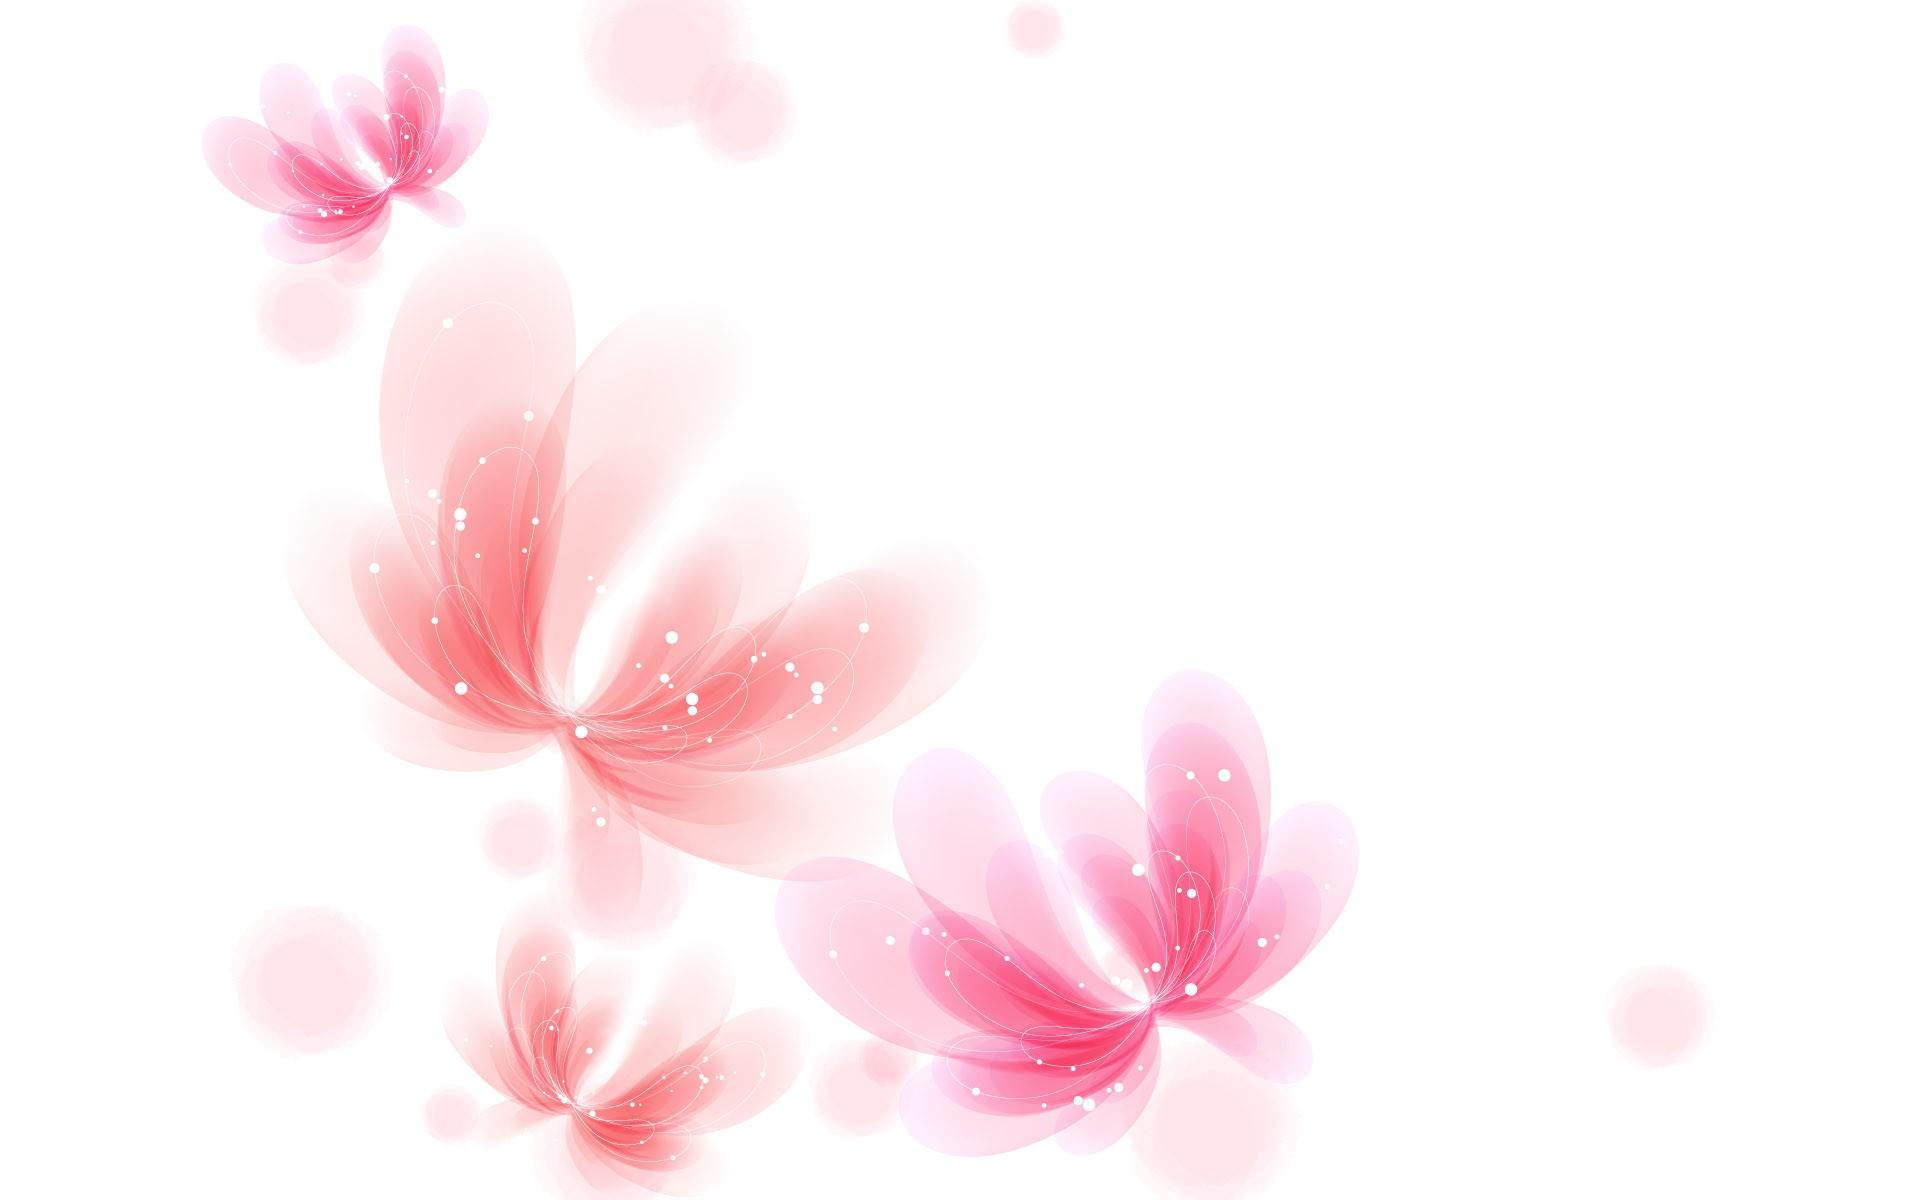 Pink White Wallpaper 19201200 Pink White Background 1920x1200